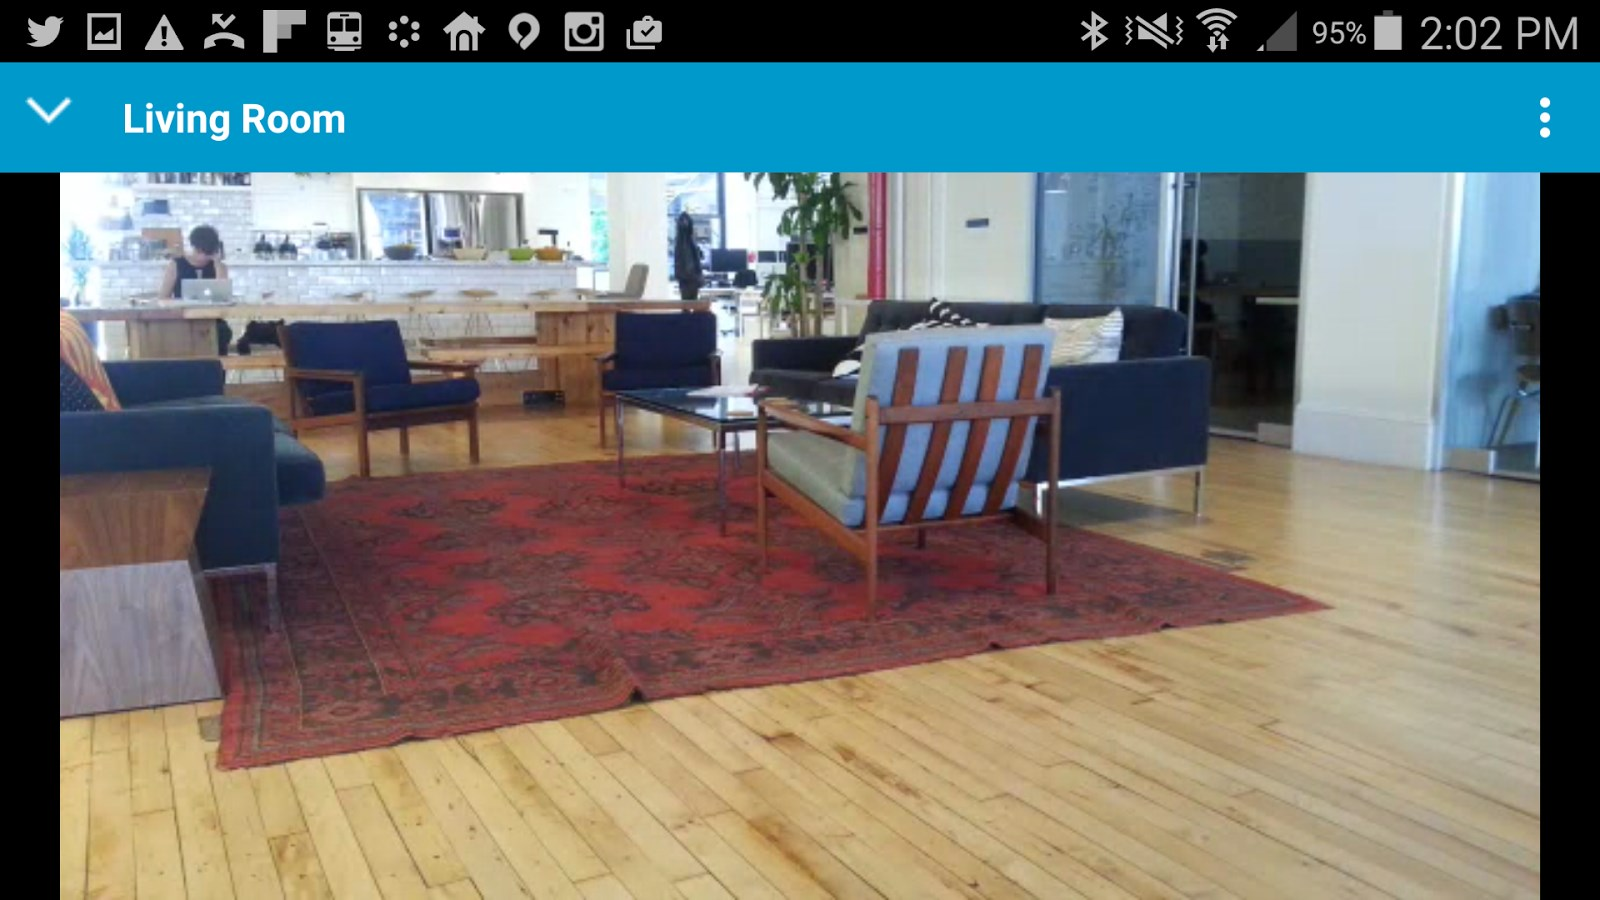 Perch - Simple Home Monitoring - Imagem 3 do software